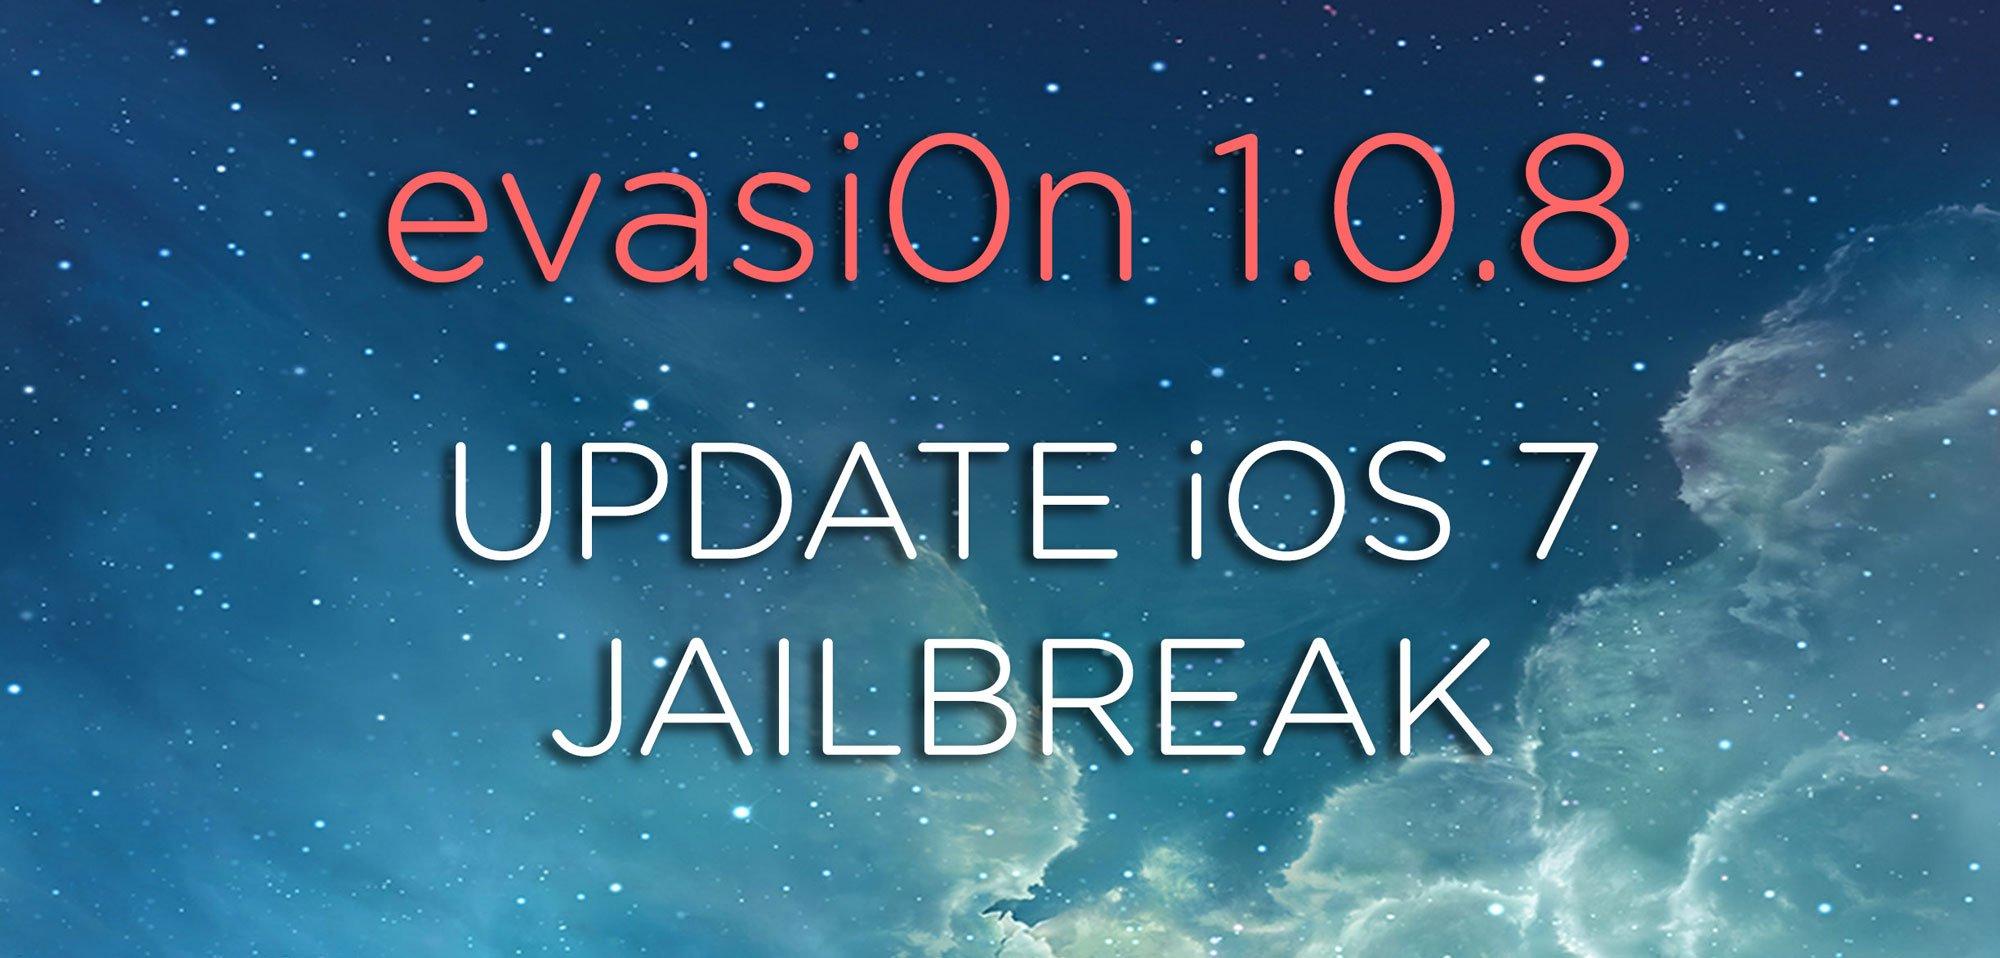 iOS 7 Jailbreak Update: evasi0n 1.0.8 Download verfügbar! 3